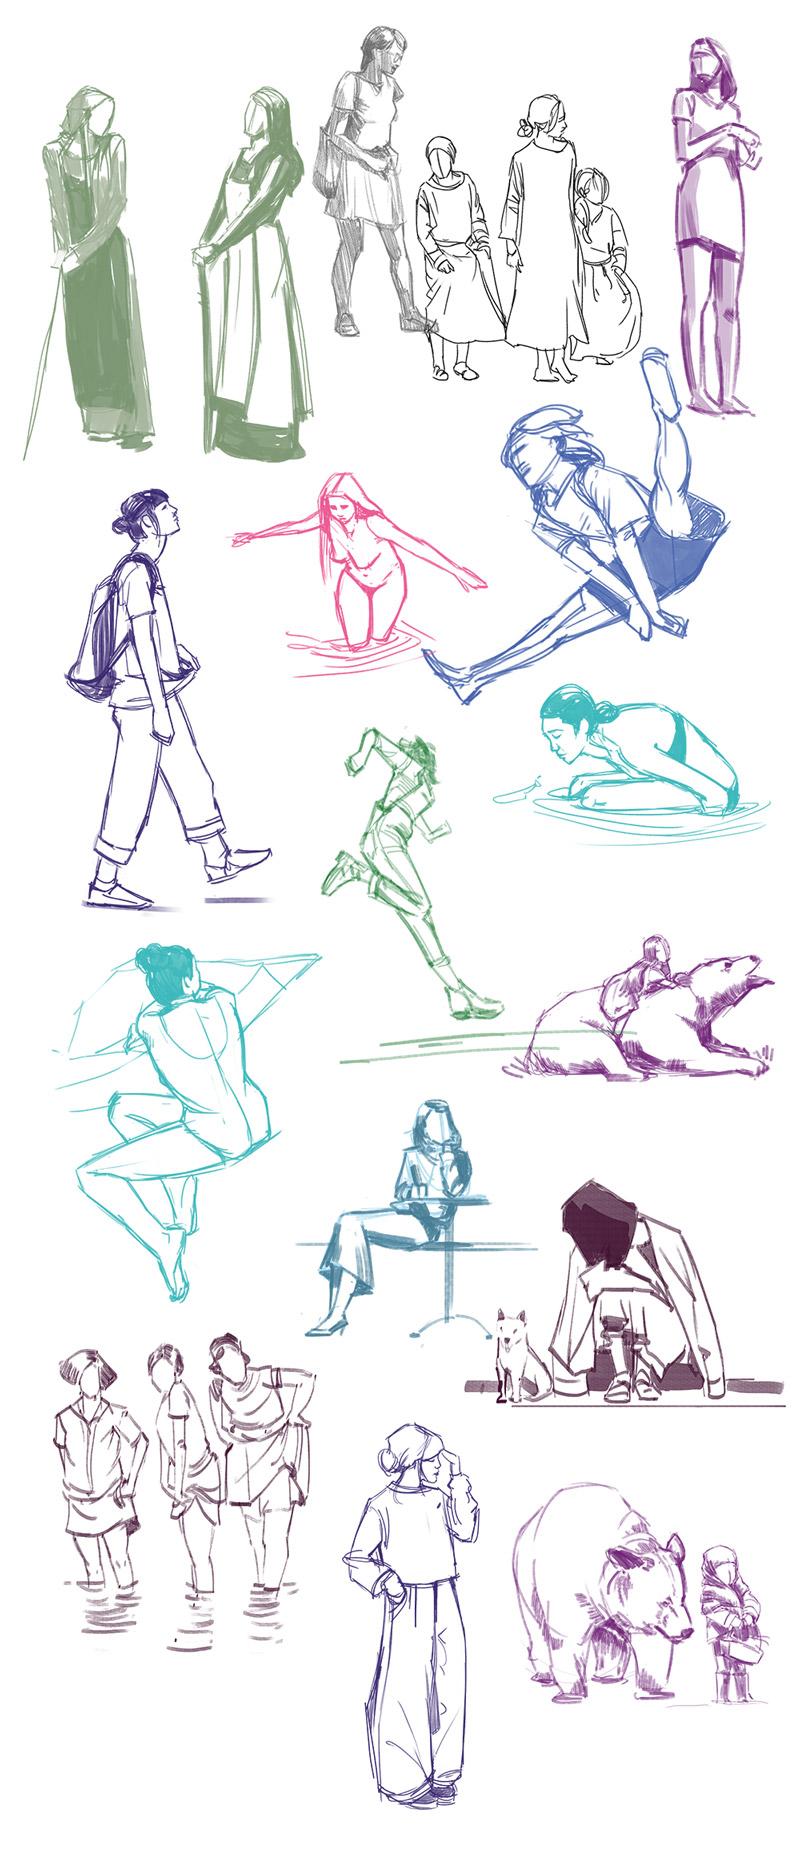 Sketch de Sandrine Pilloud - pose studies